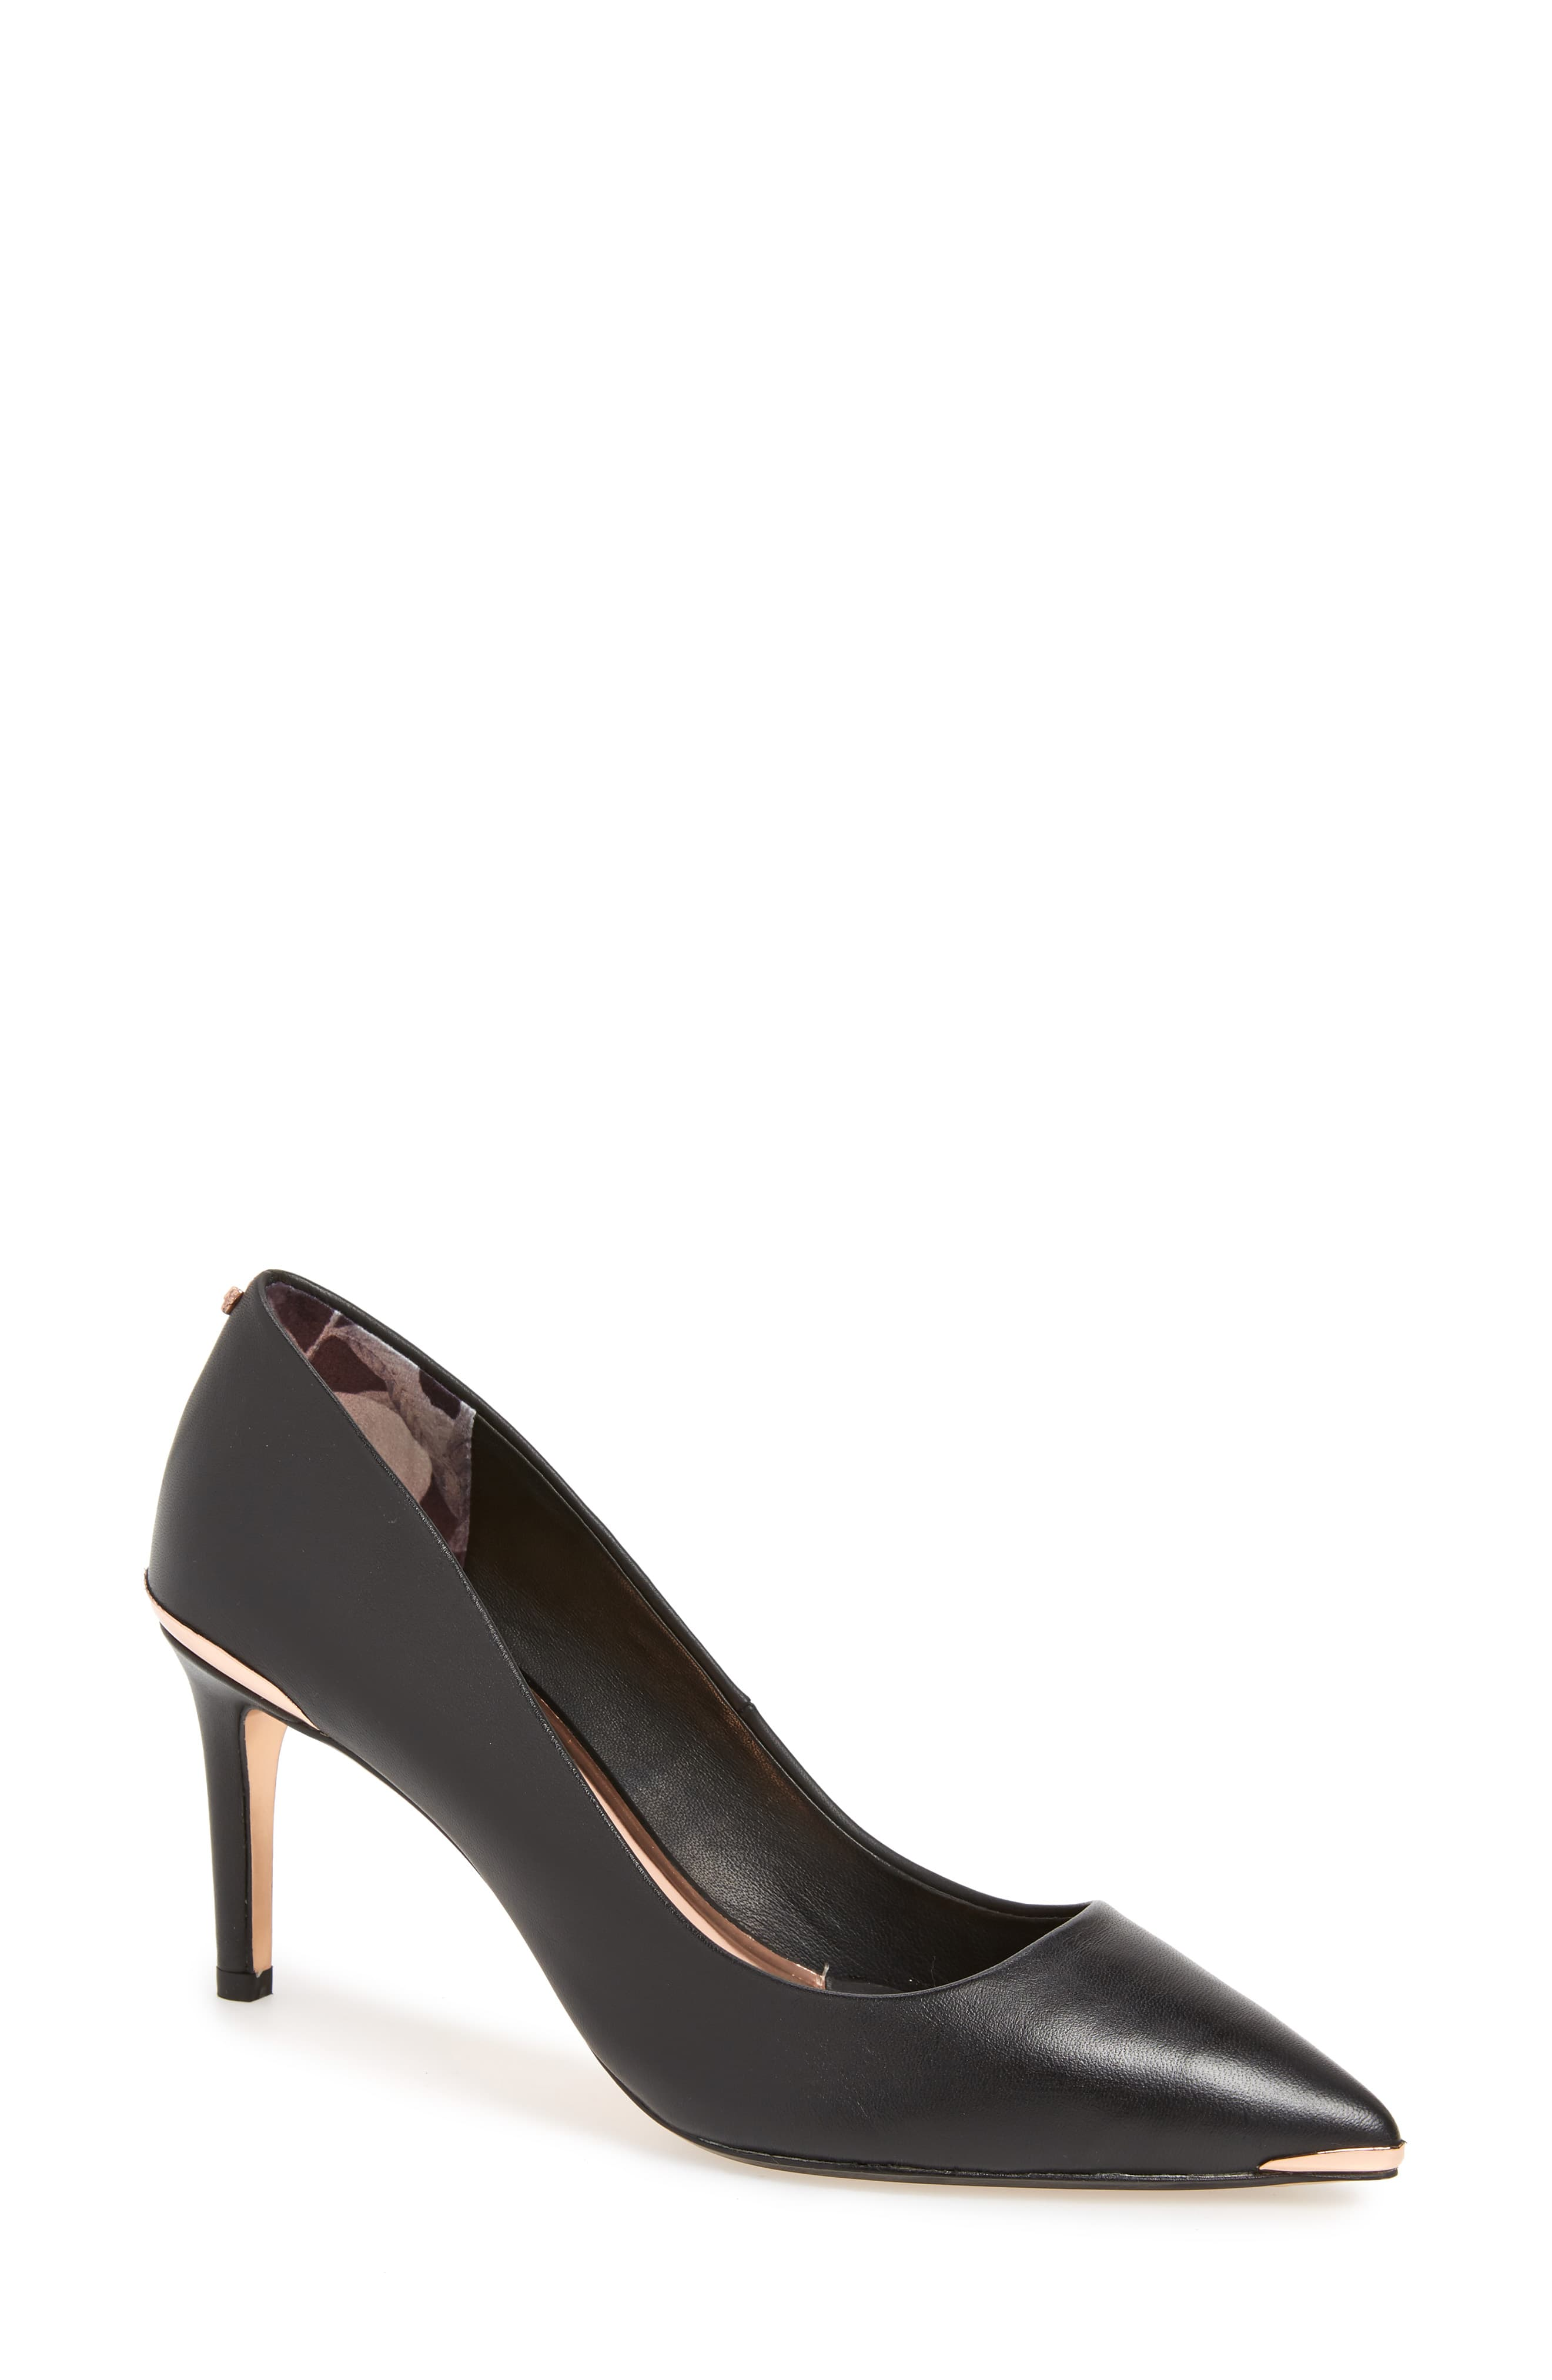 9f2ff477175 Women's Ted Baker London Wishiri Pump, Size 5US / 35.5EU - Red in ...